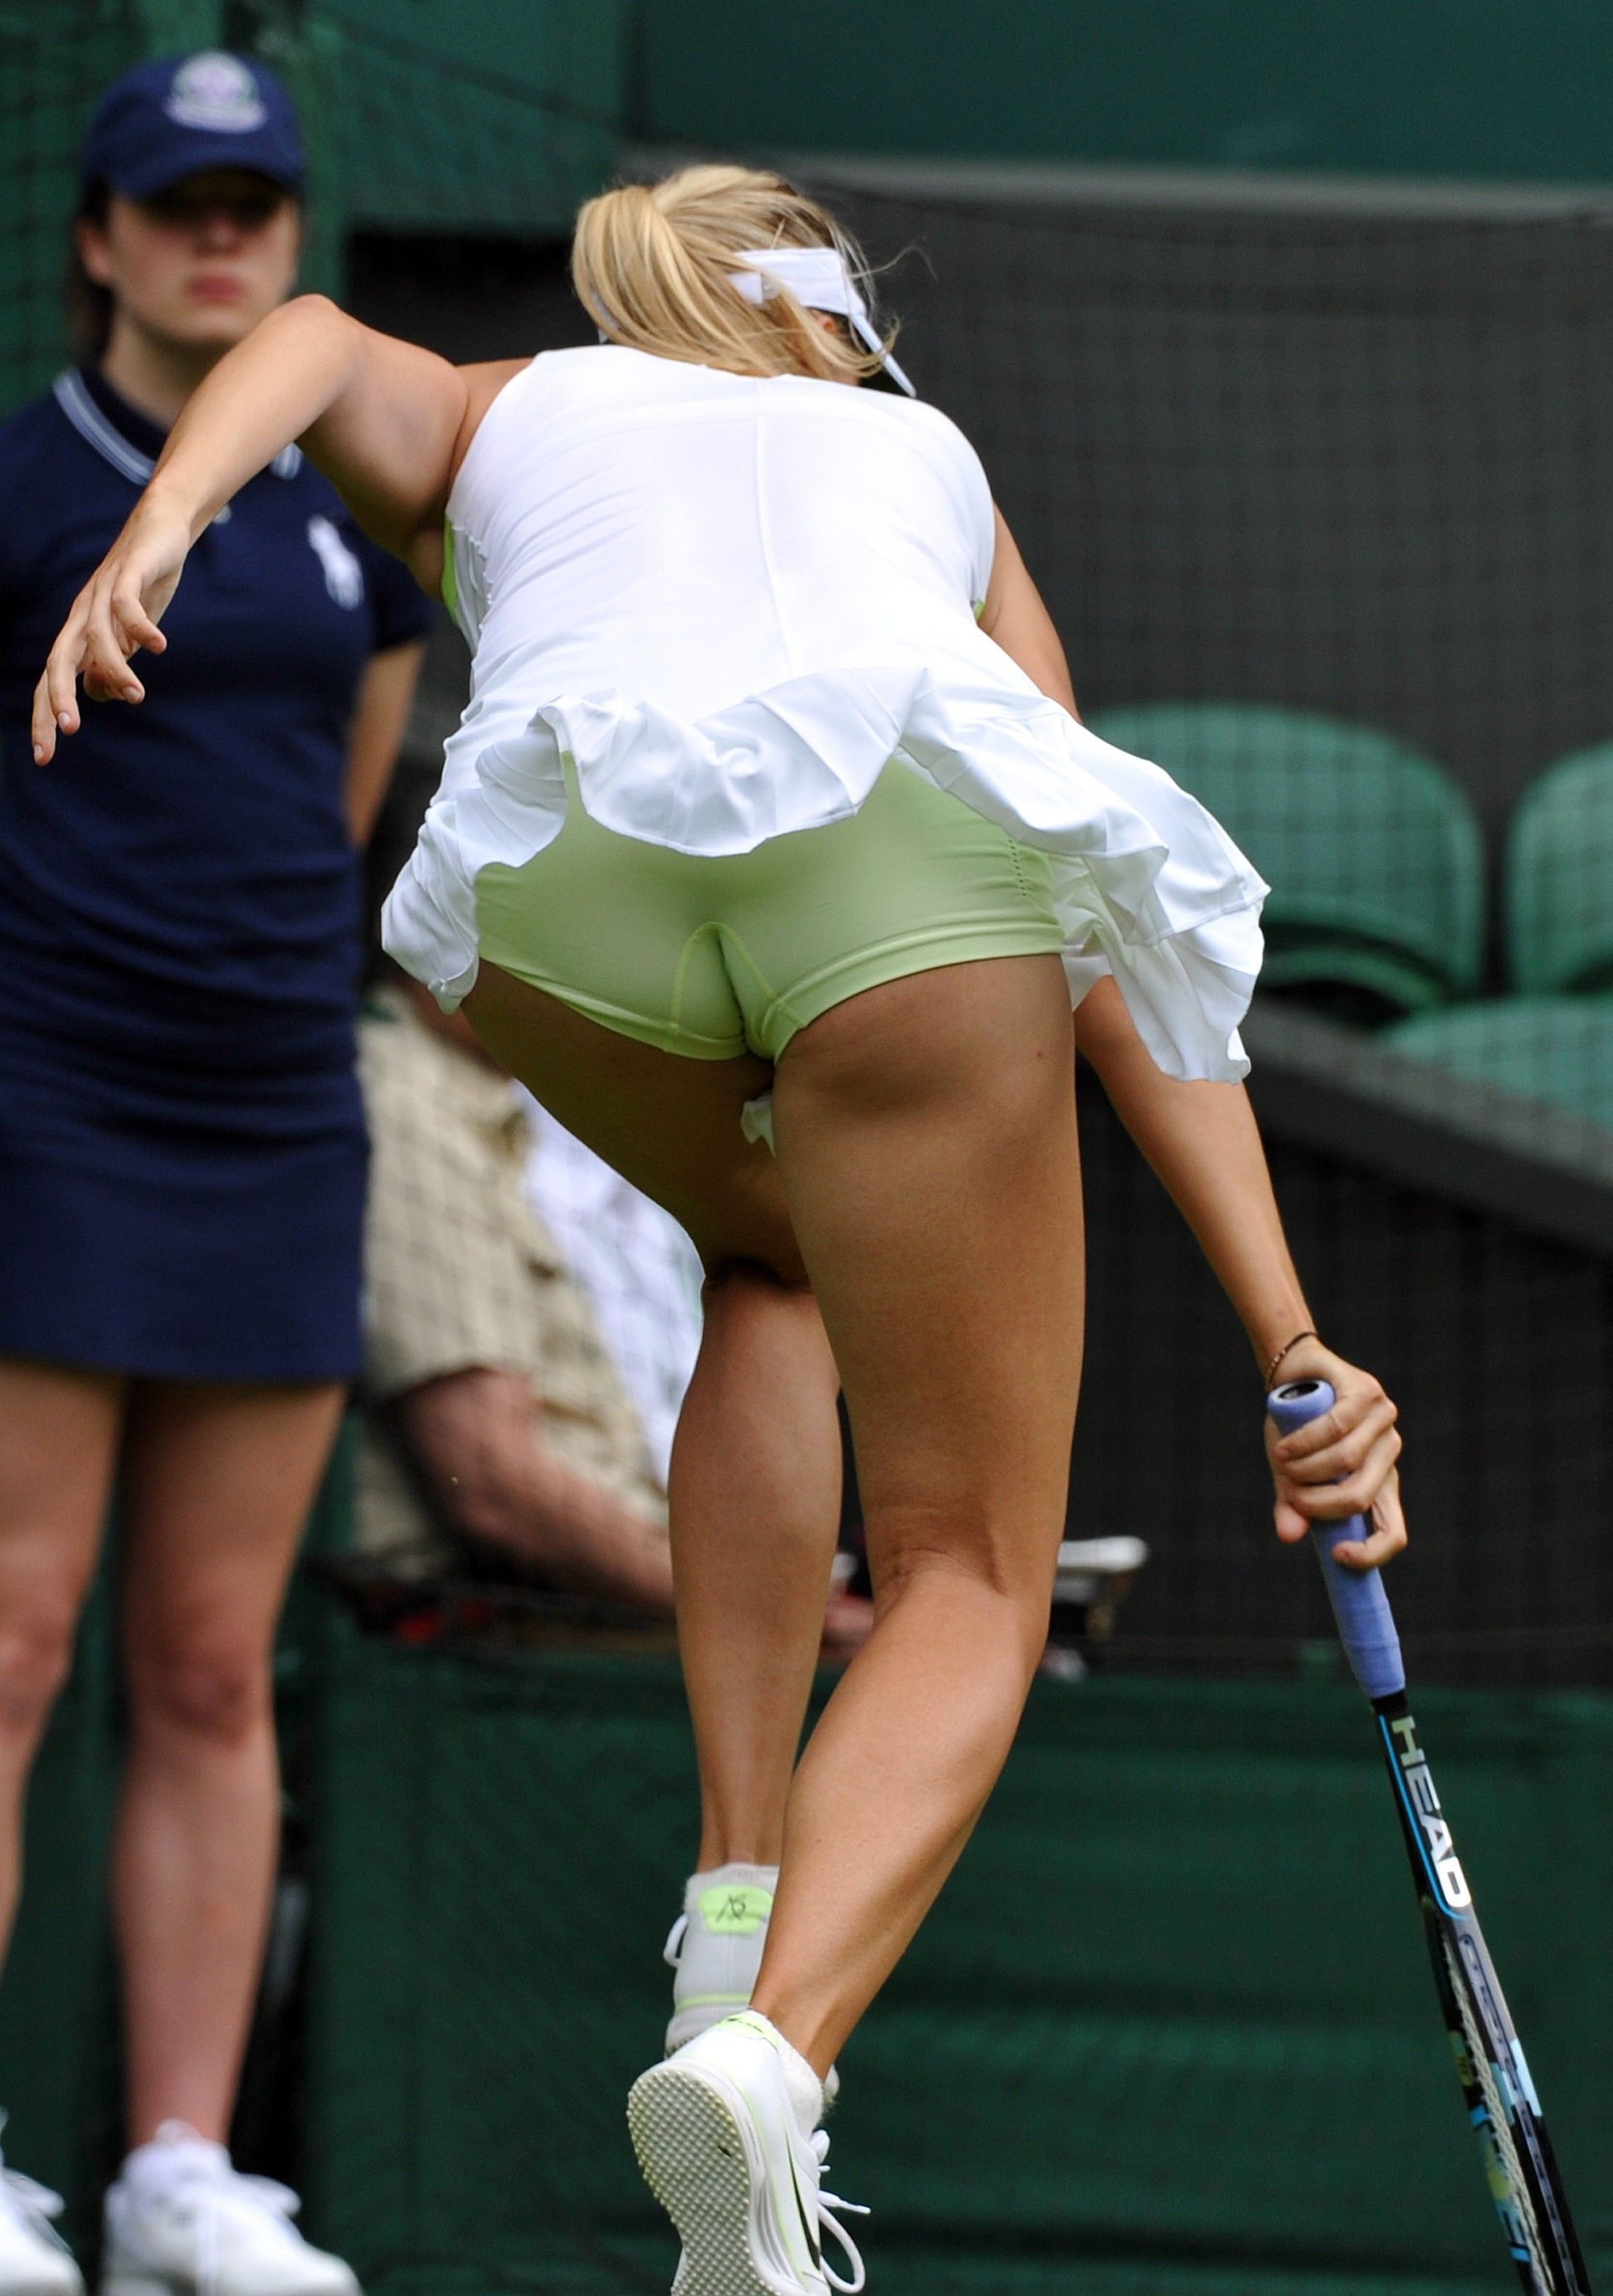 Tennis Upskirt Panties 2